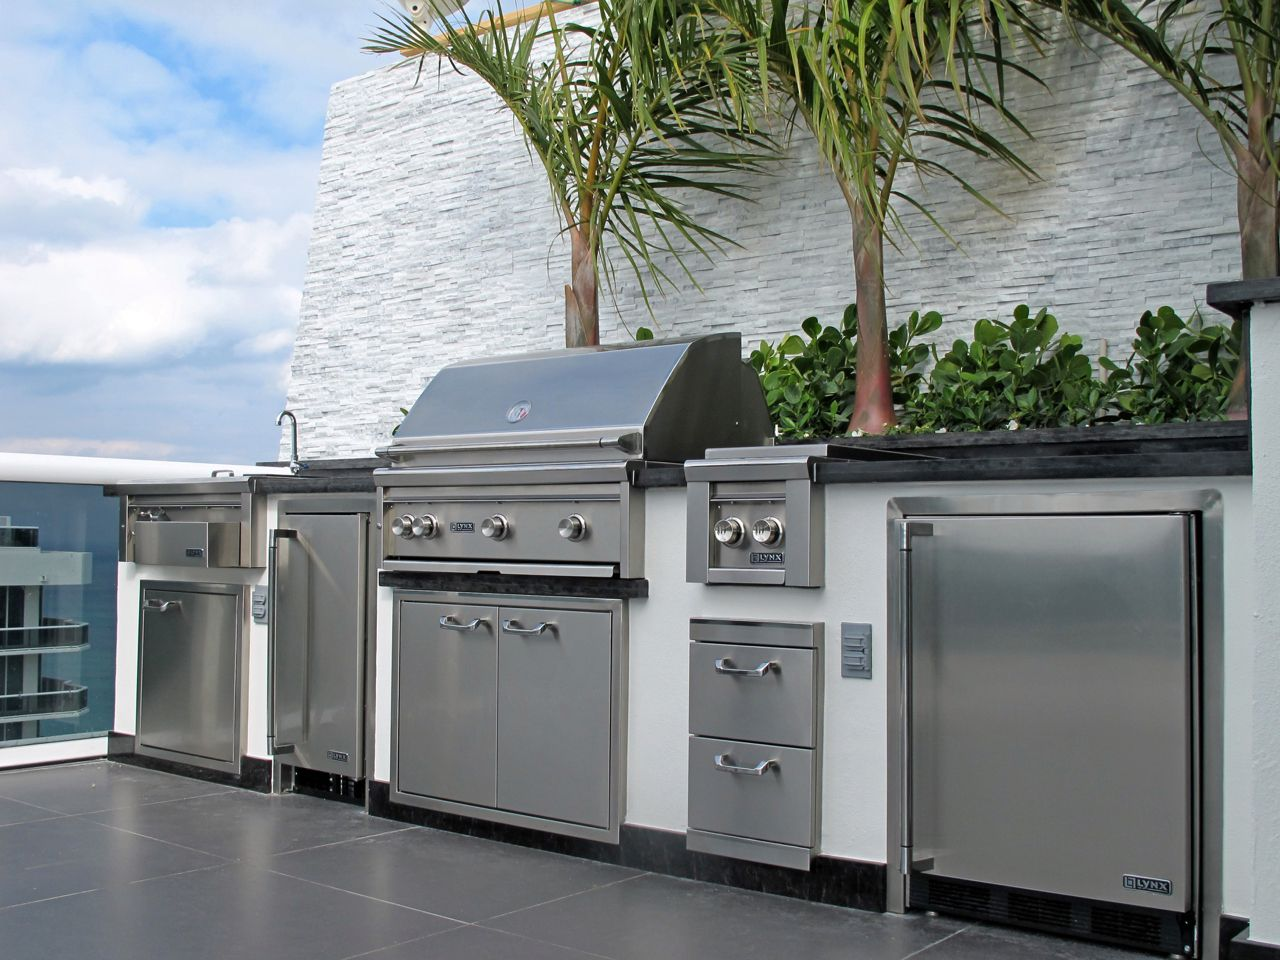 Outdoor Kitchens 6 Luxapatio Outdoor Kitchen Design Outdoor Kitchen Simple Outdoor Kitchen